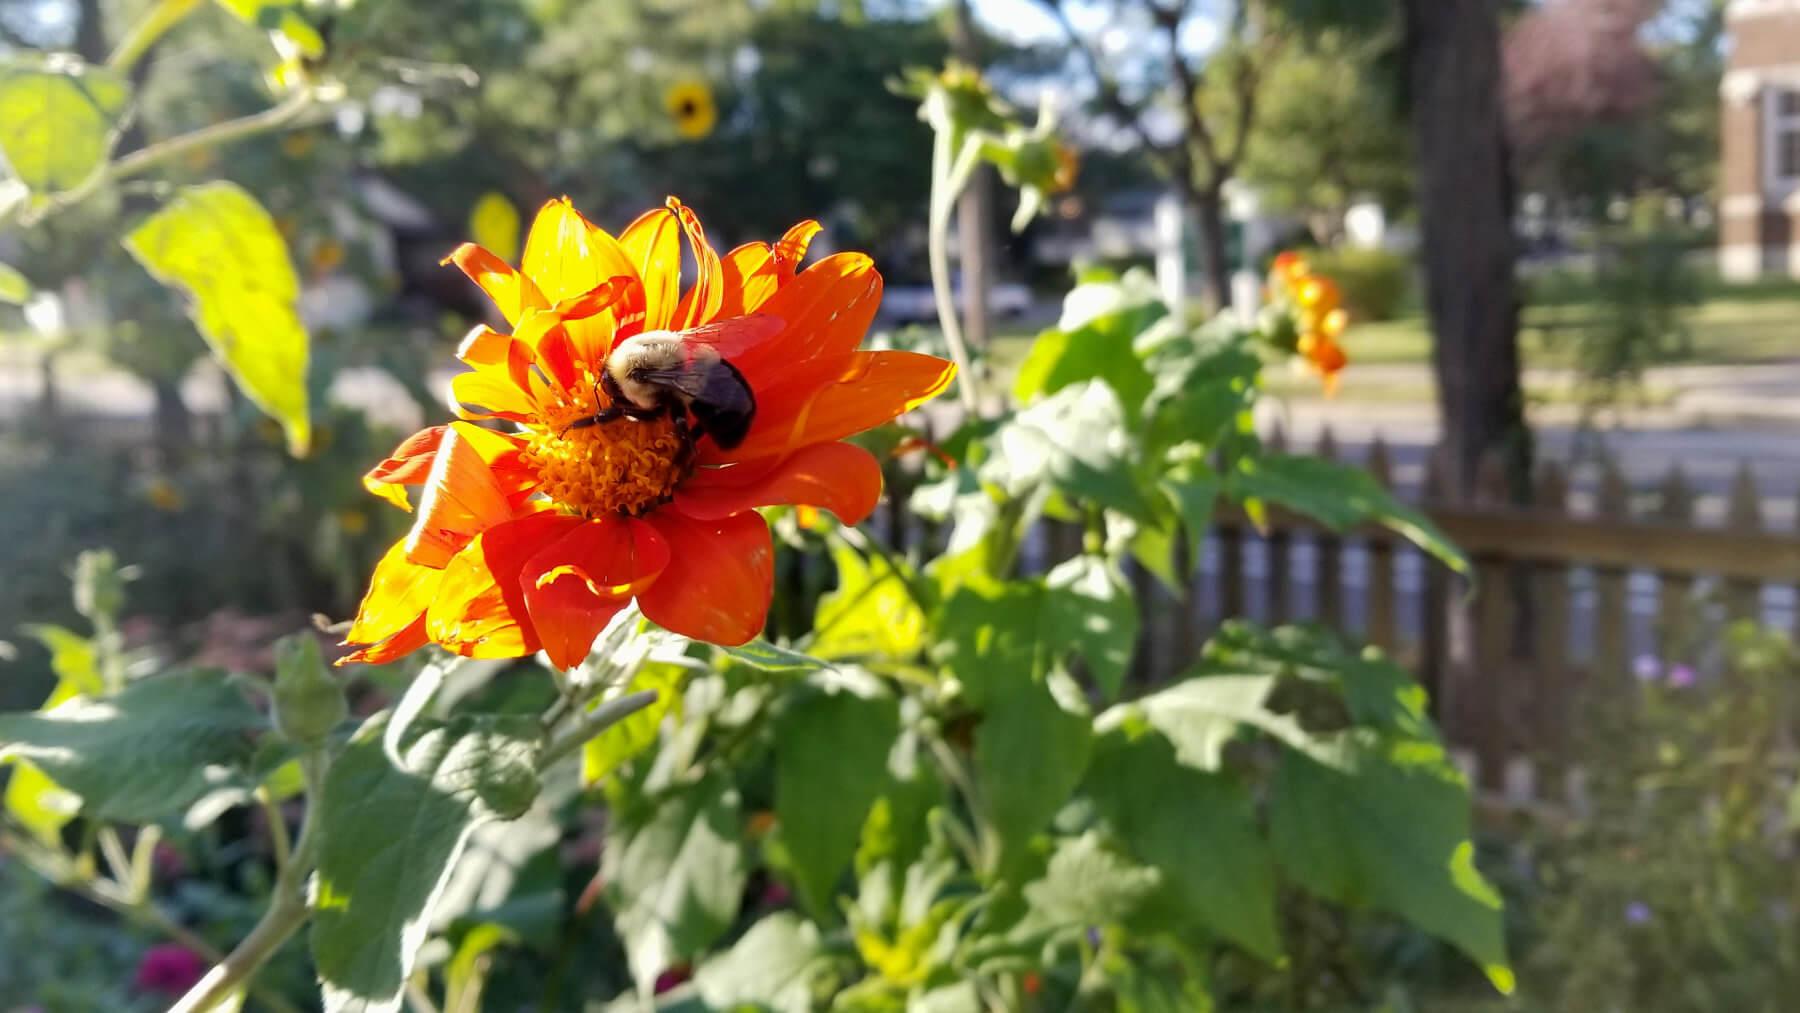 bee on a flower in a city garden